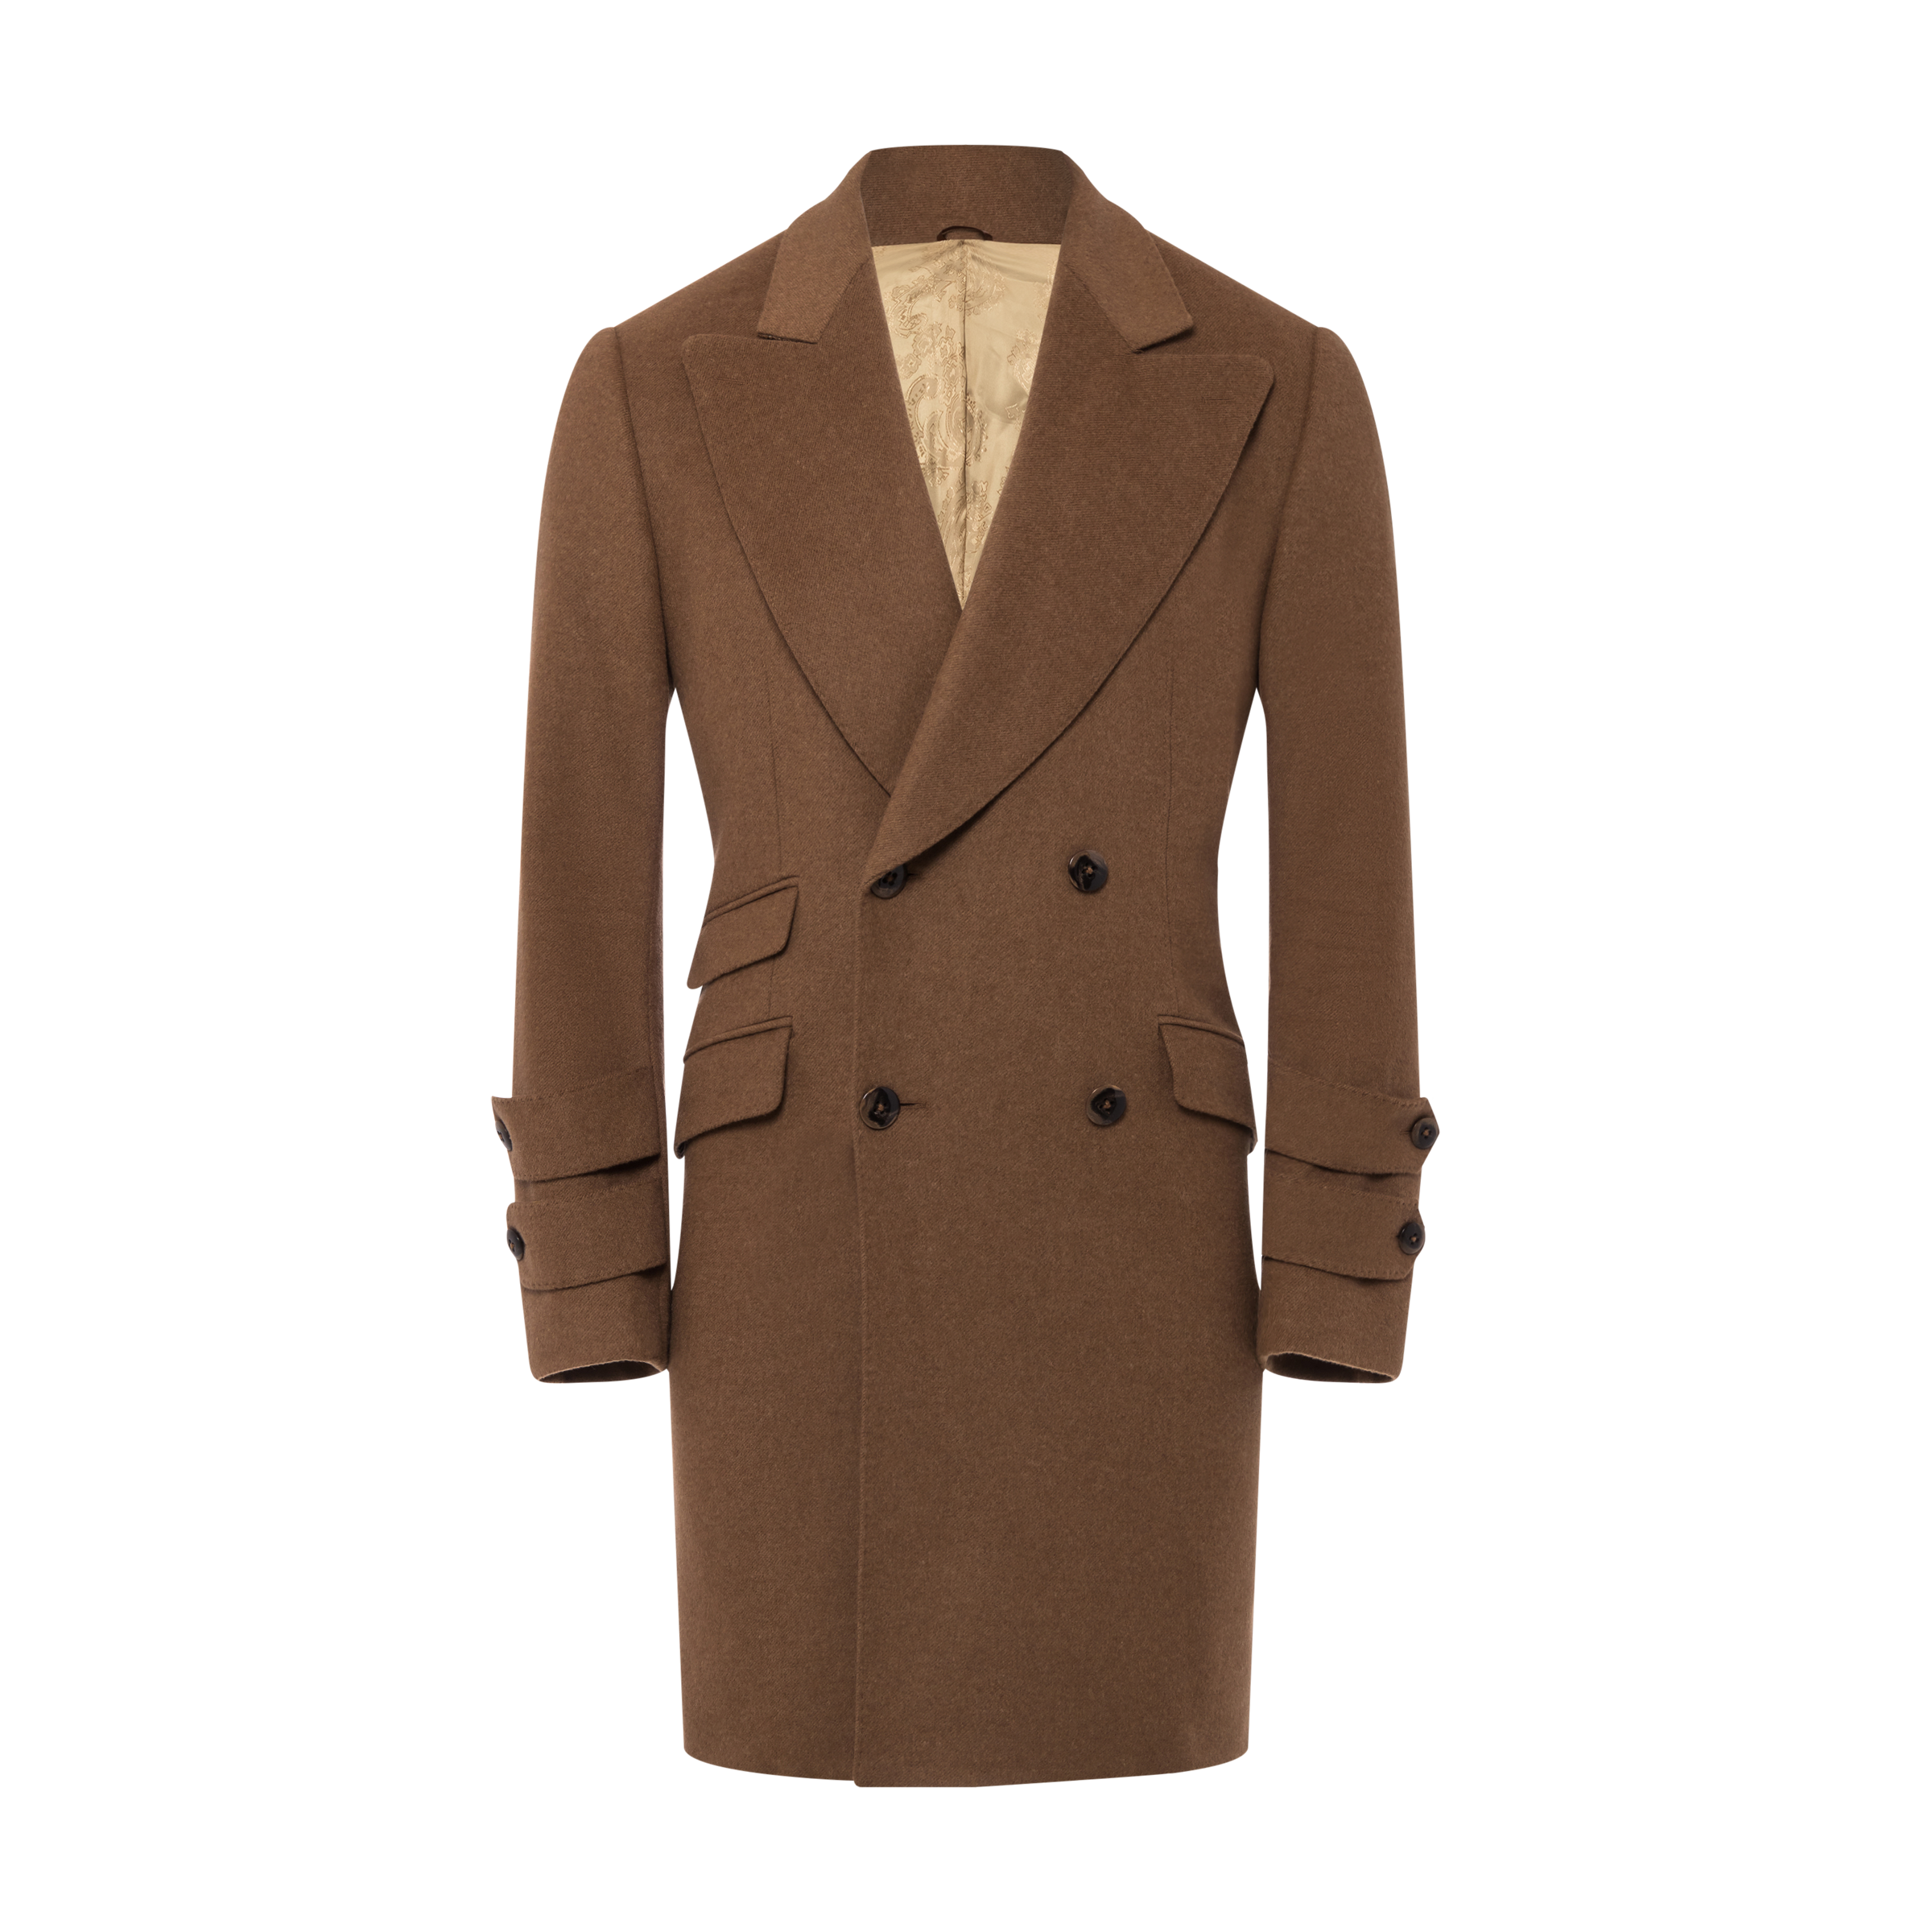 Coats product photo